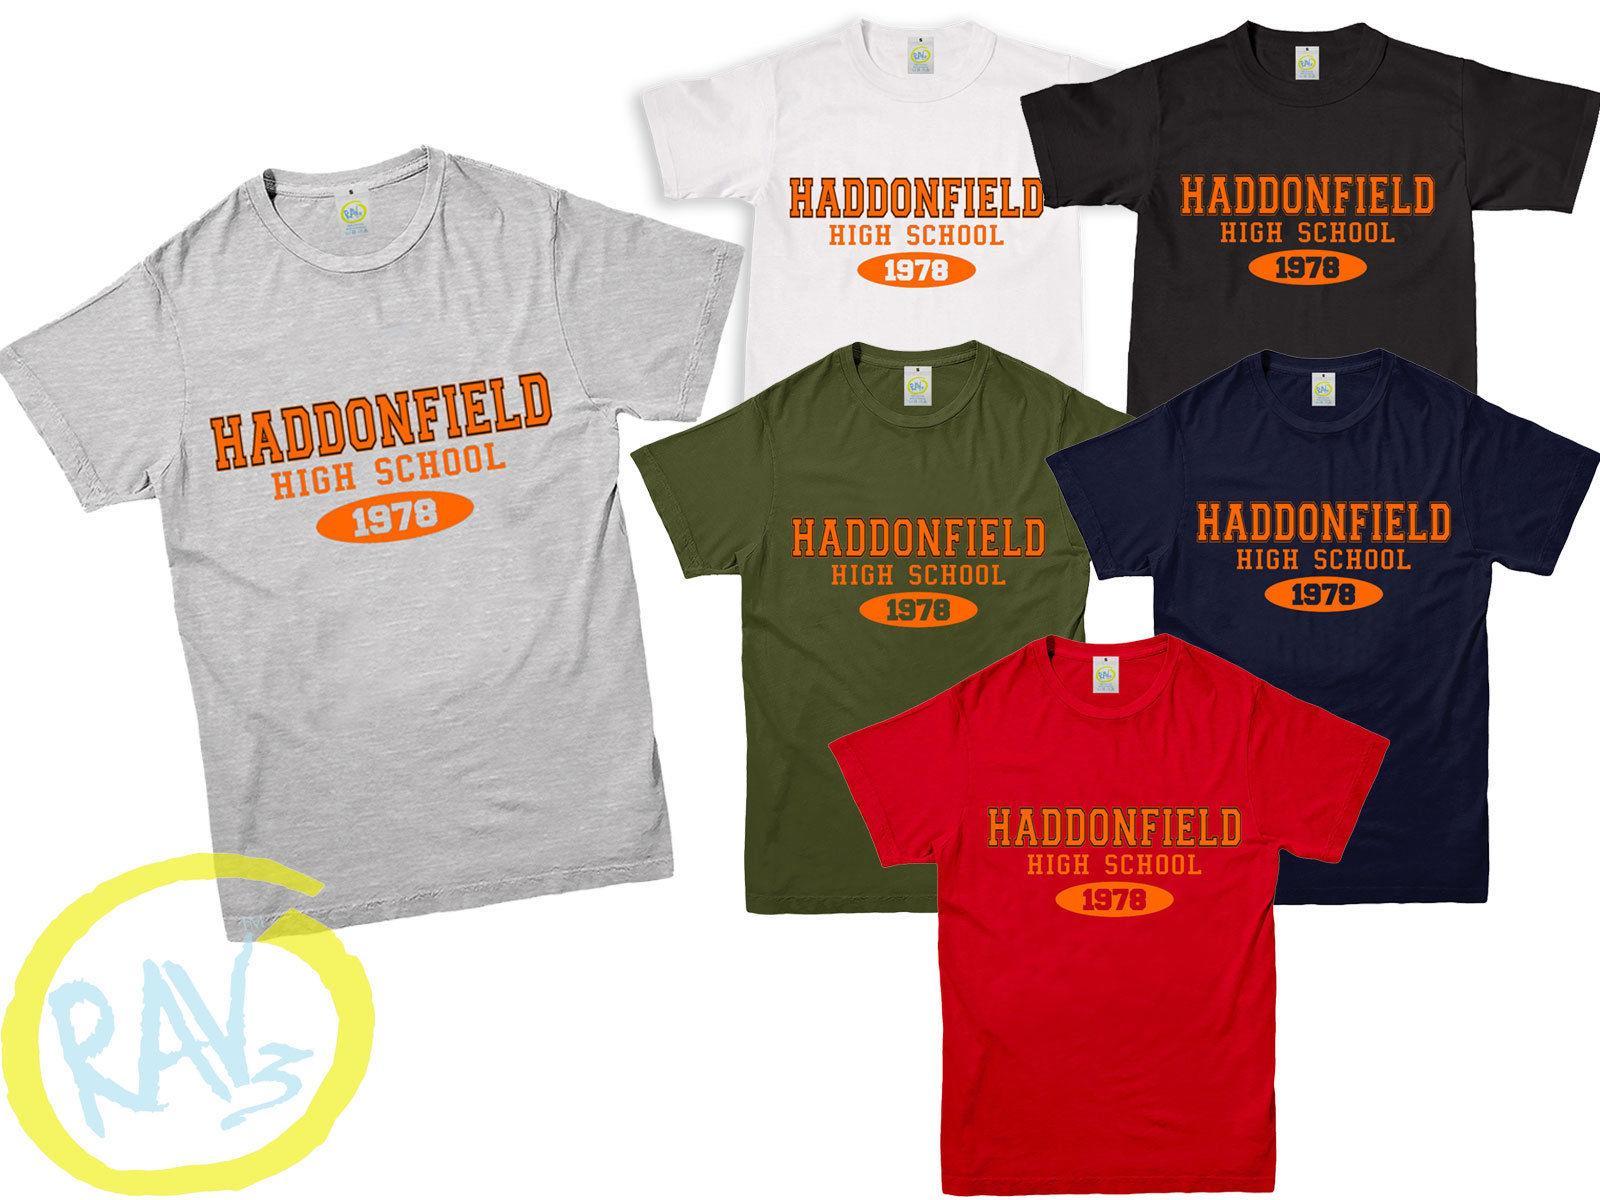 High School Sports Team Shirts - DREAMWORKS